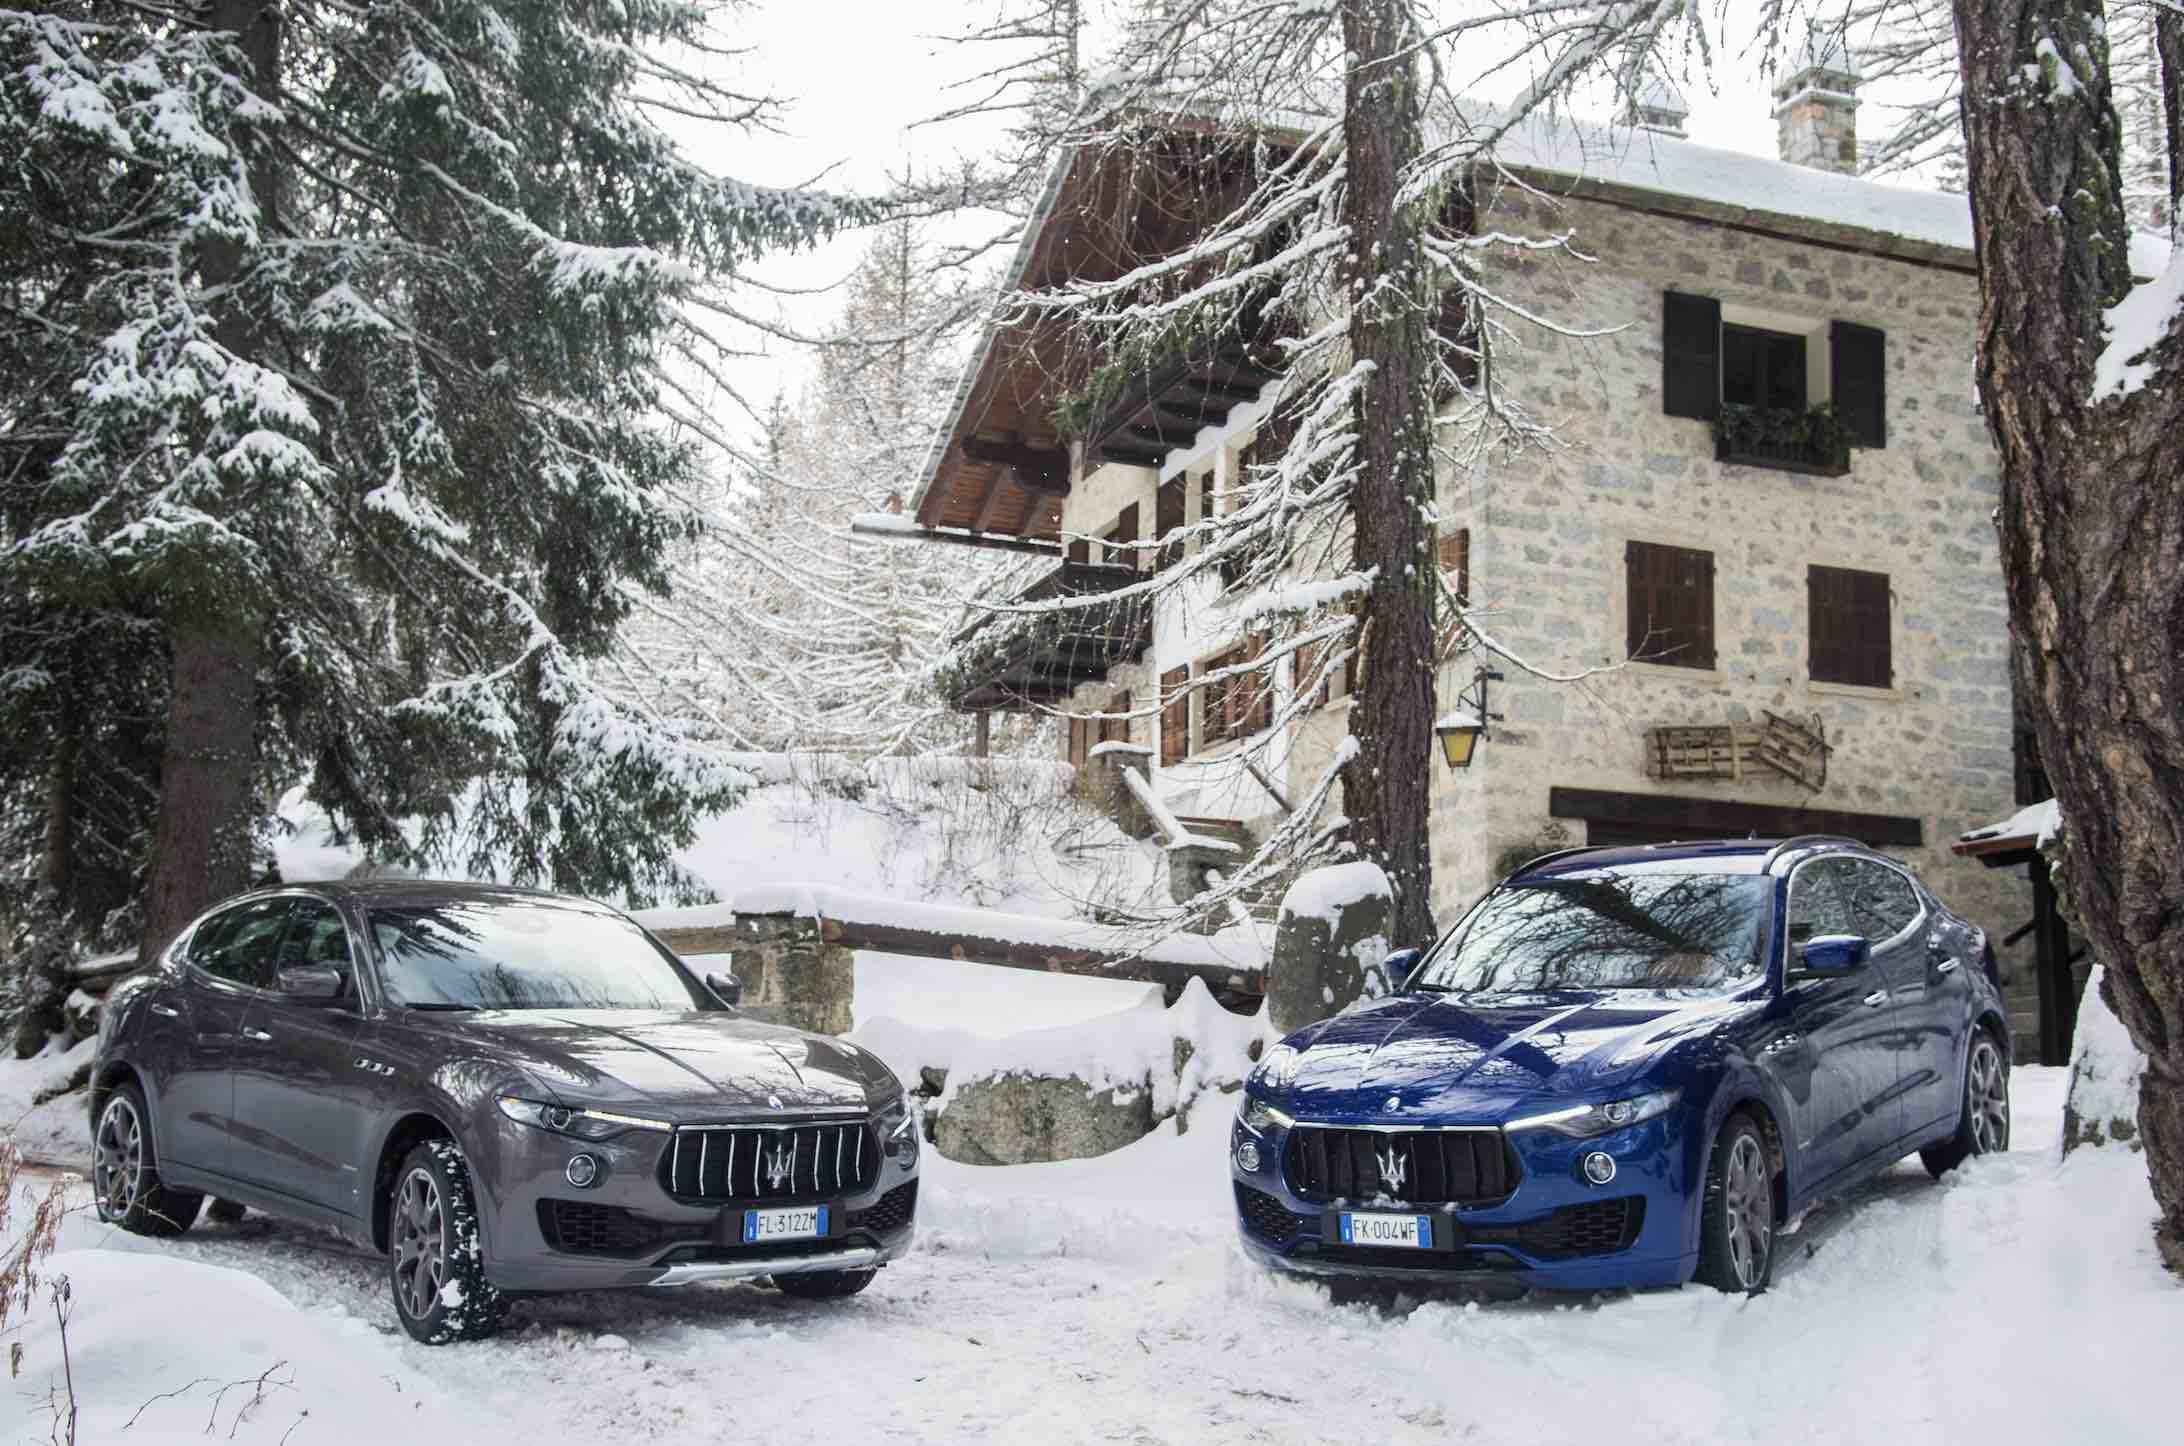 Maserati Marriott winter scene in front of Italian resort